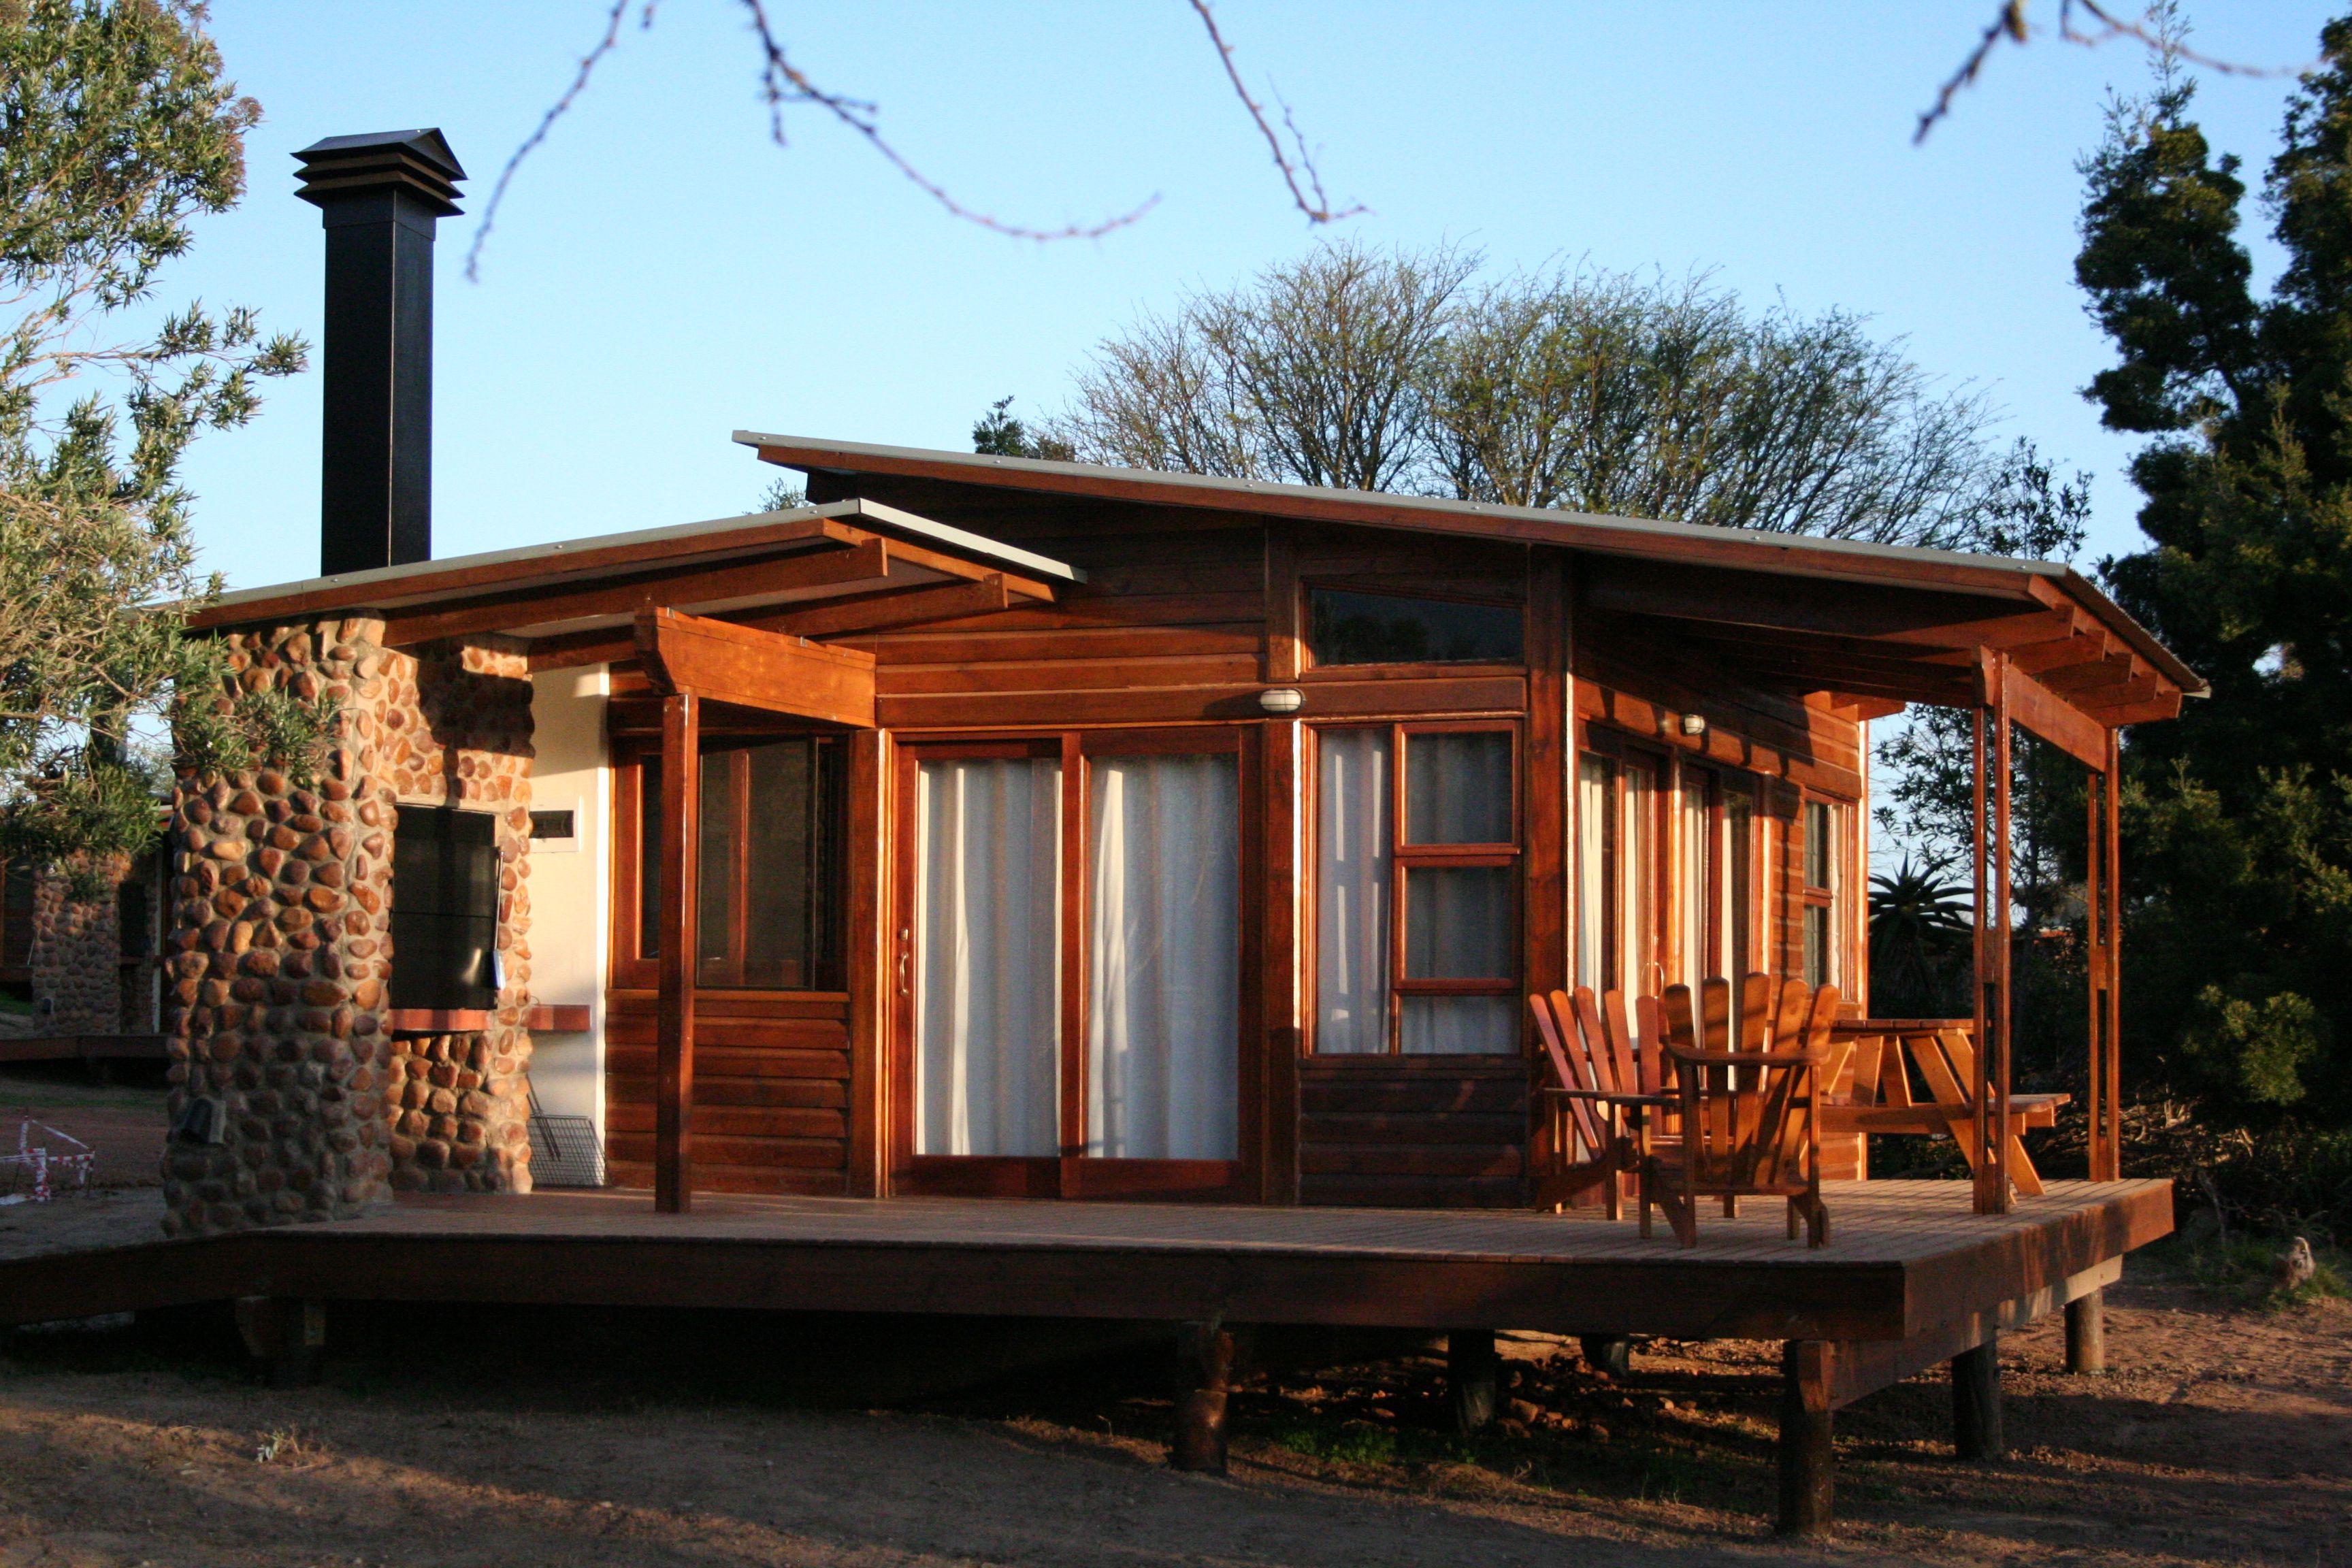 Bontebok National Park Cabins South Africa Jacques